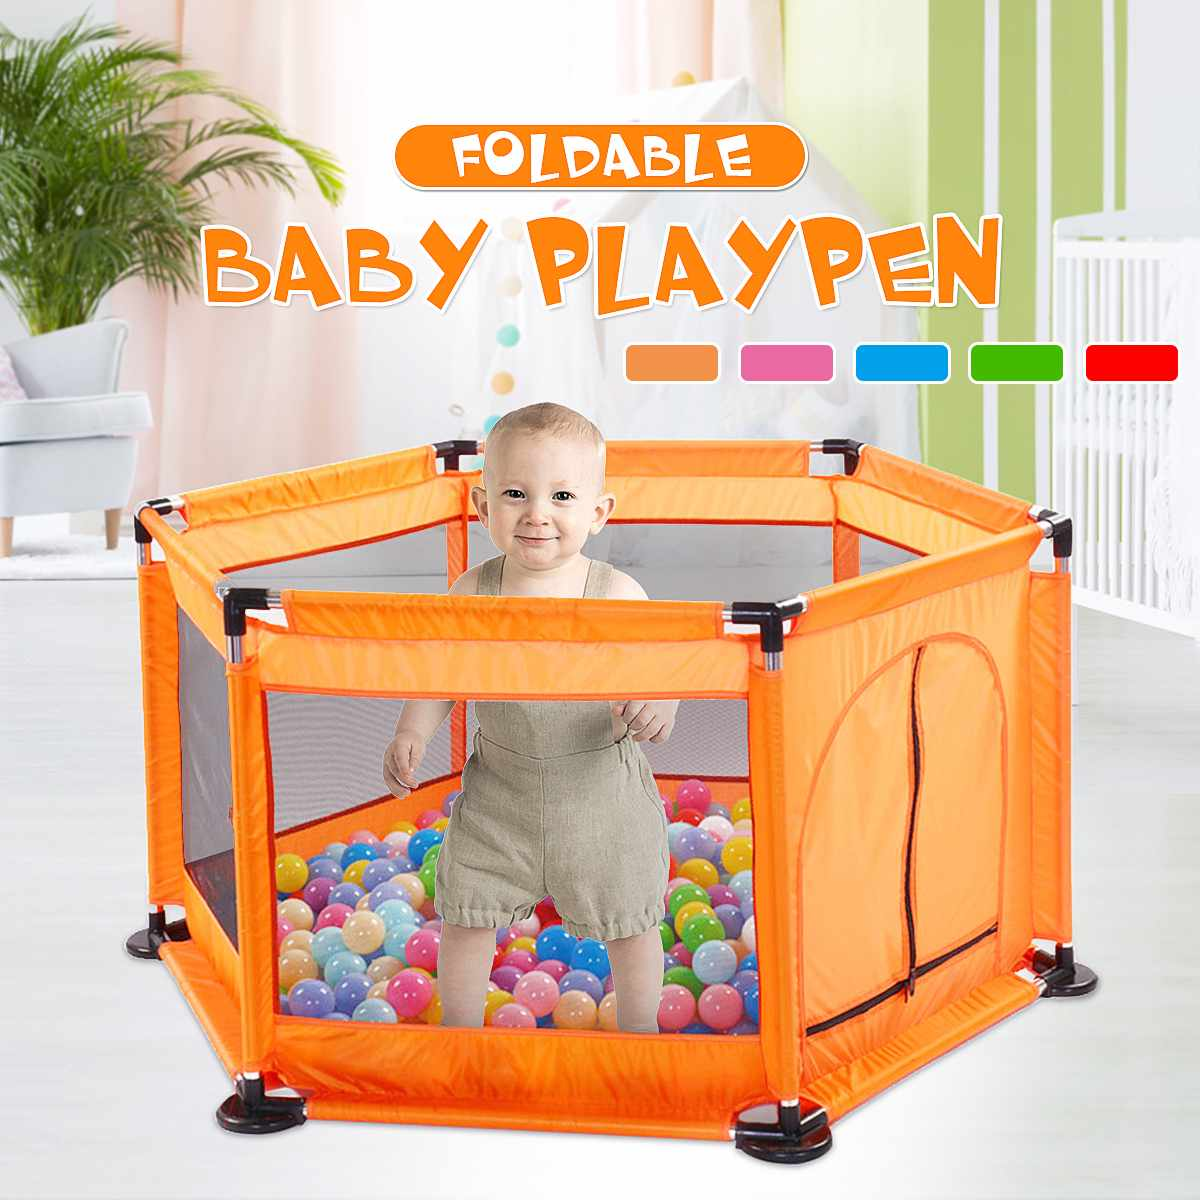 Baby Playpen Children Baby 0-6 Years Old Fence Children with Free Ocean Balls Playground Kids Ball Pool Pit Baby Playpen Balls